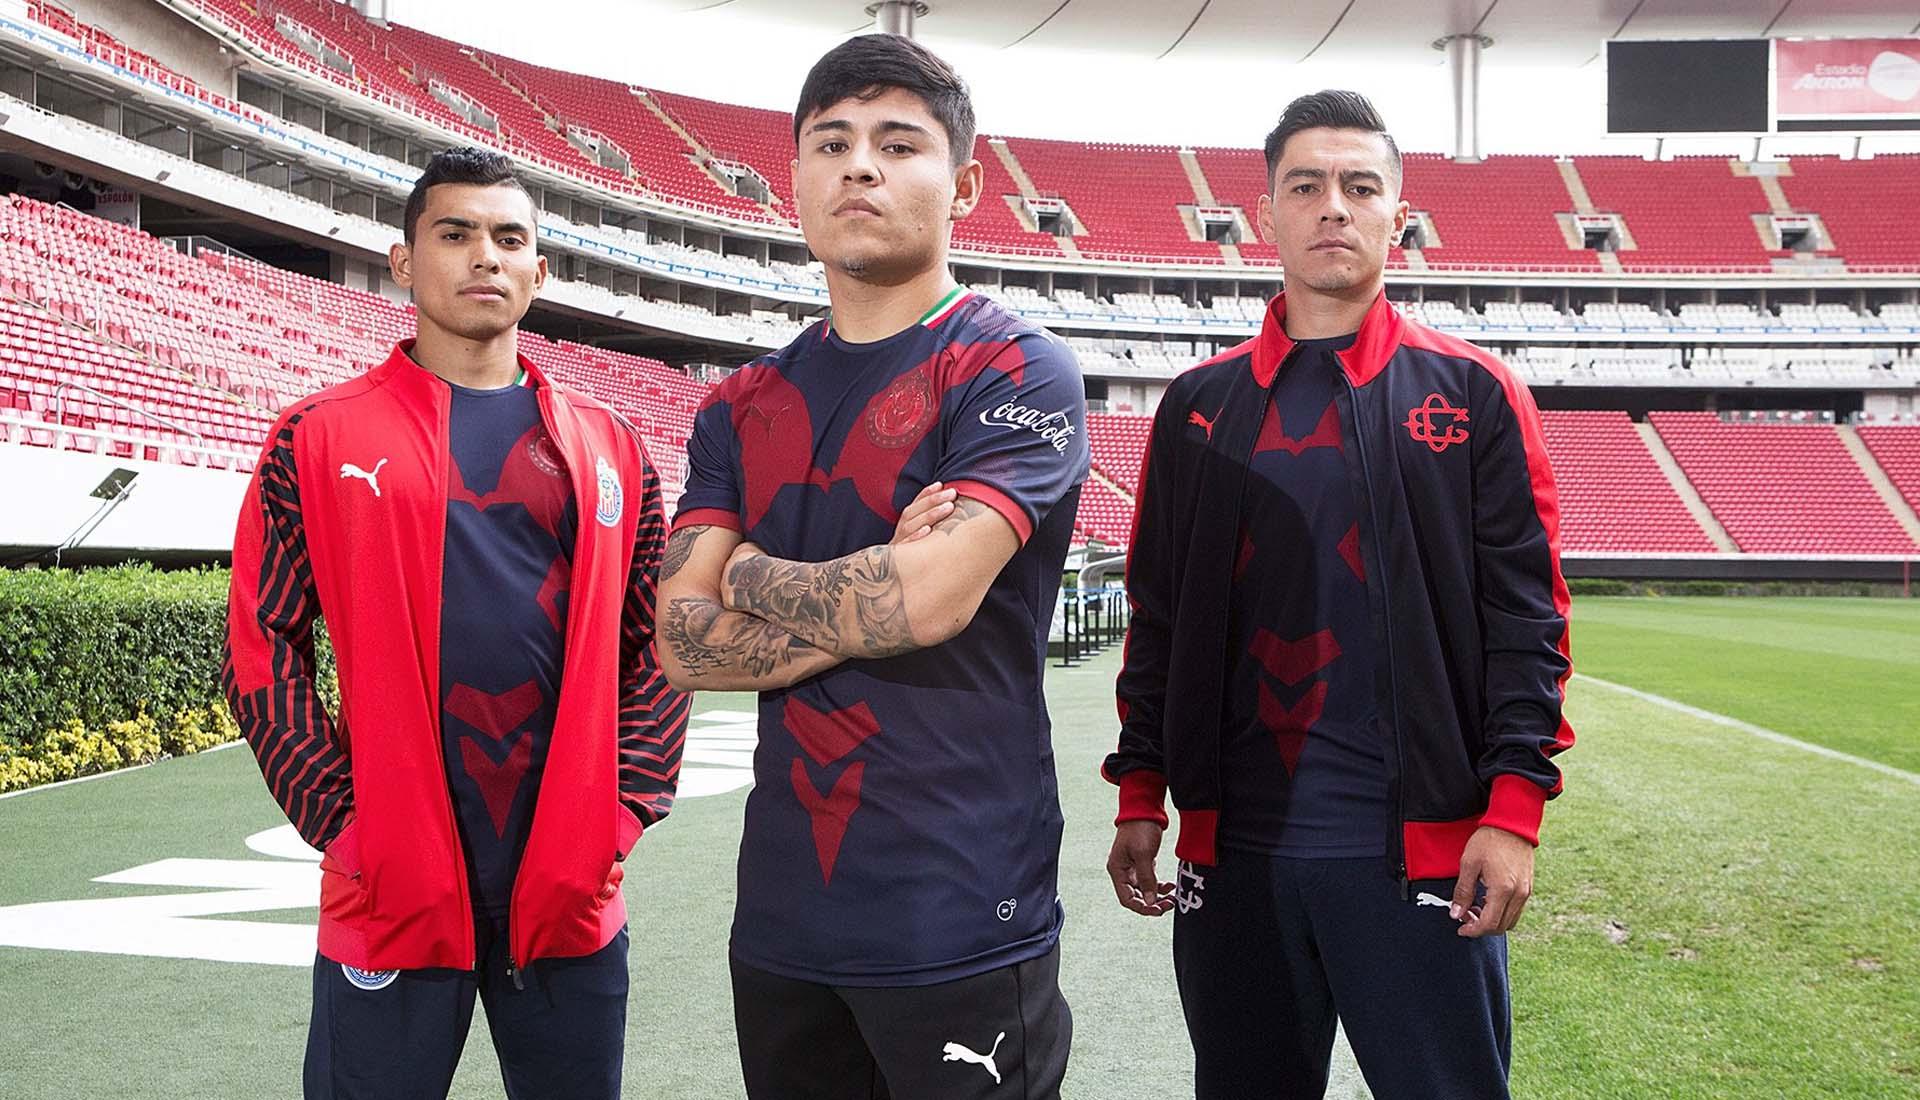 finest selection 39275 63ed1 PUMA Reveal Chivas 18/19 Third Shirt - SoccerBible